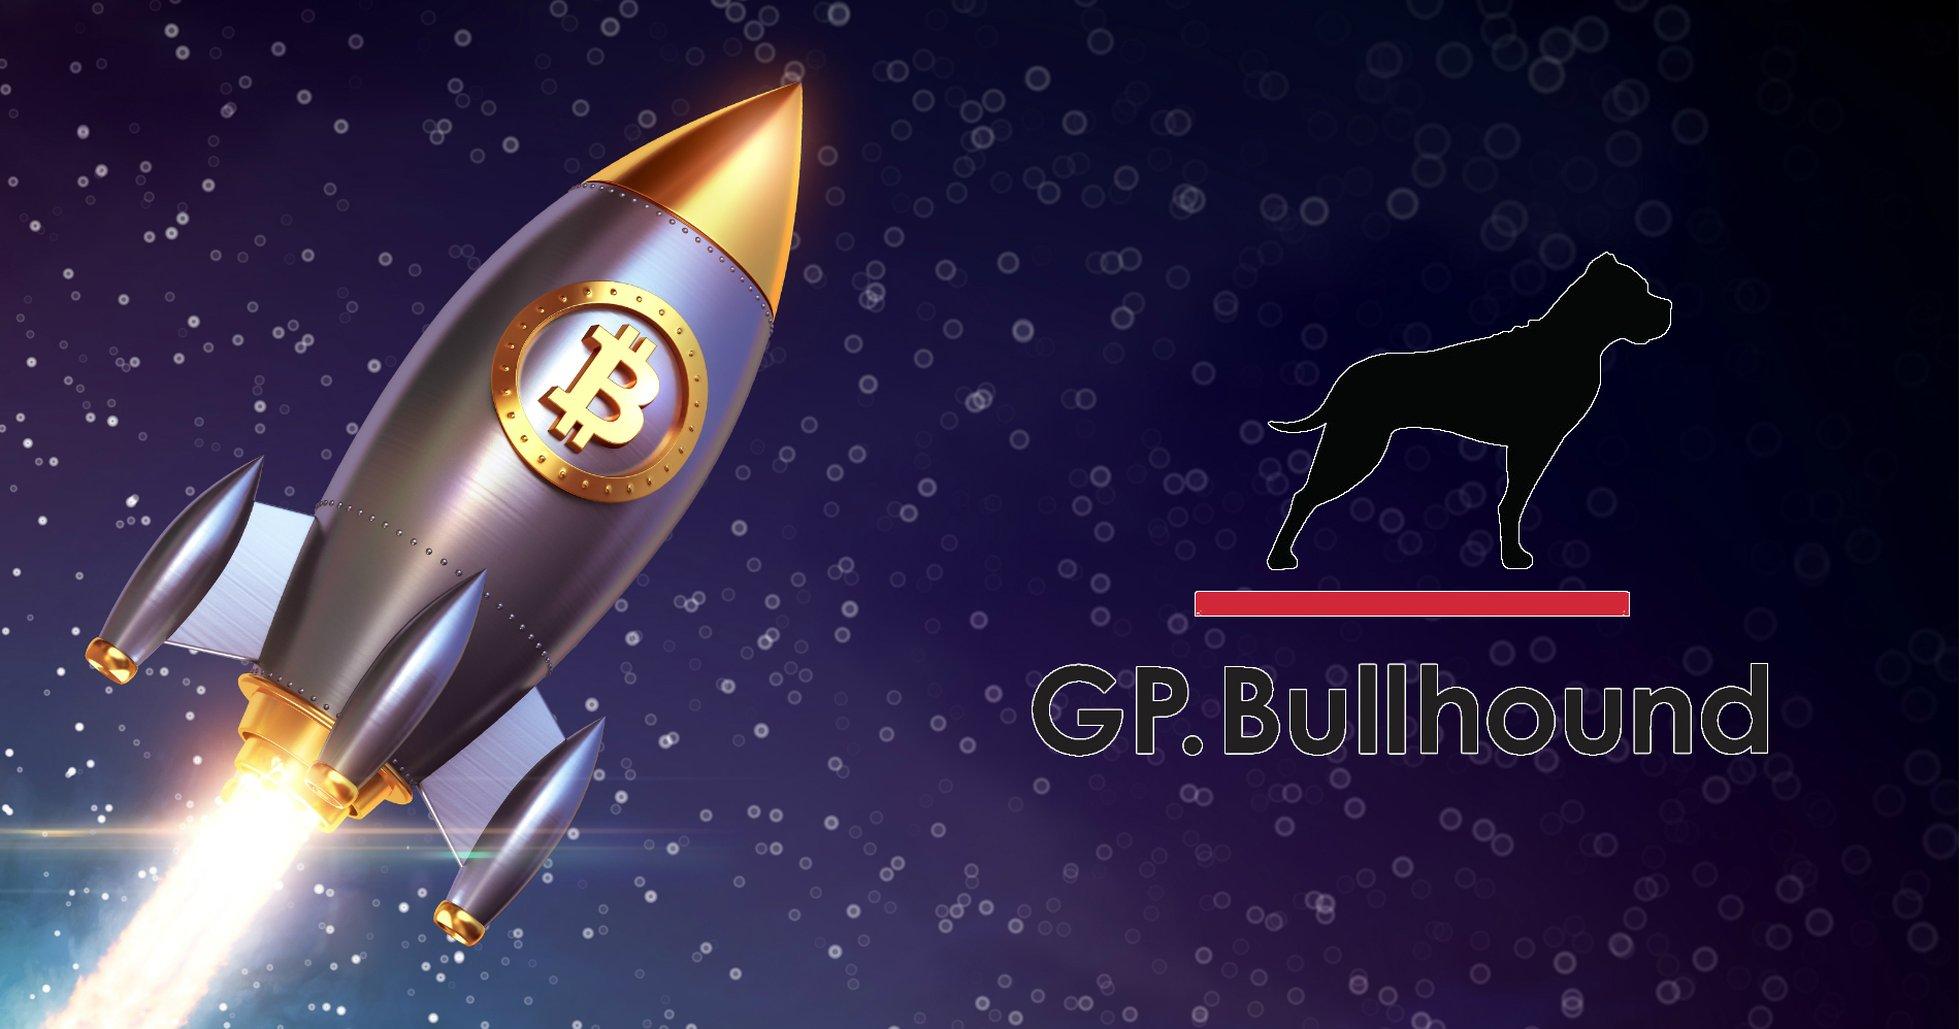 GP Bullhound spår en ny kryptovalutehype